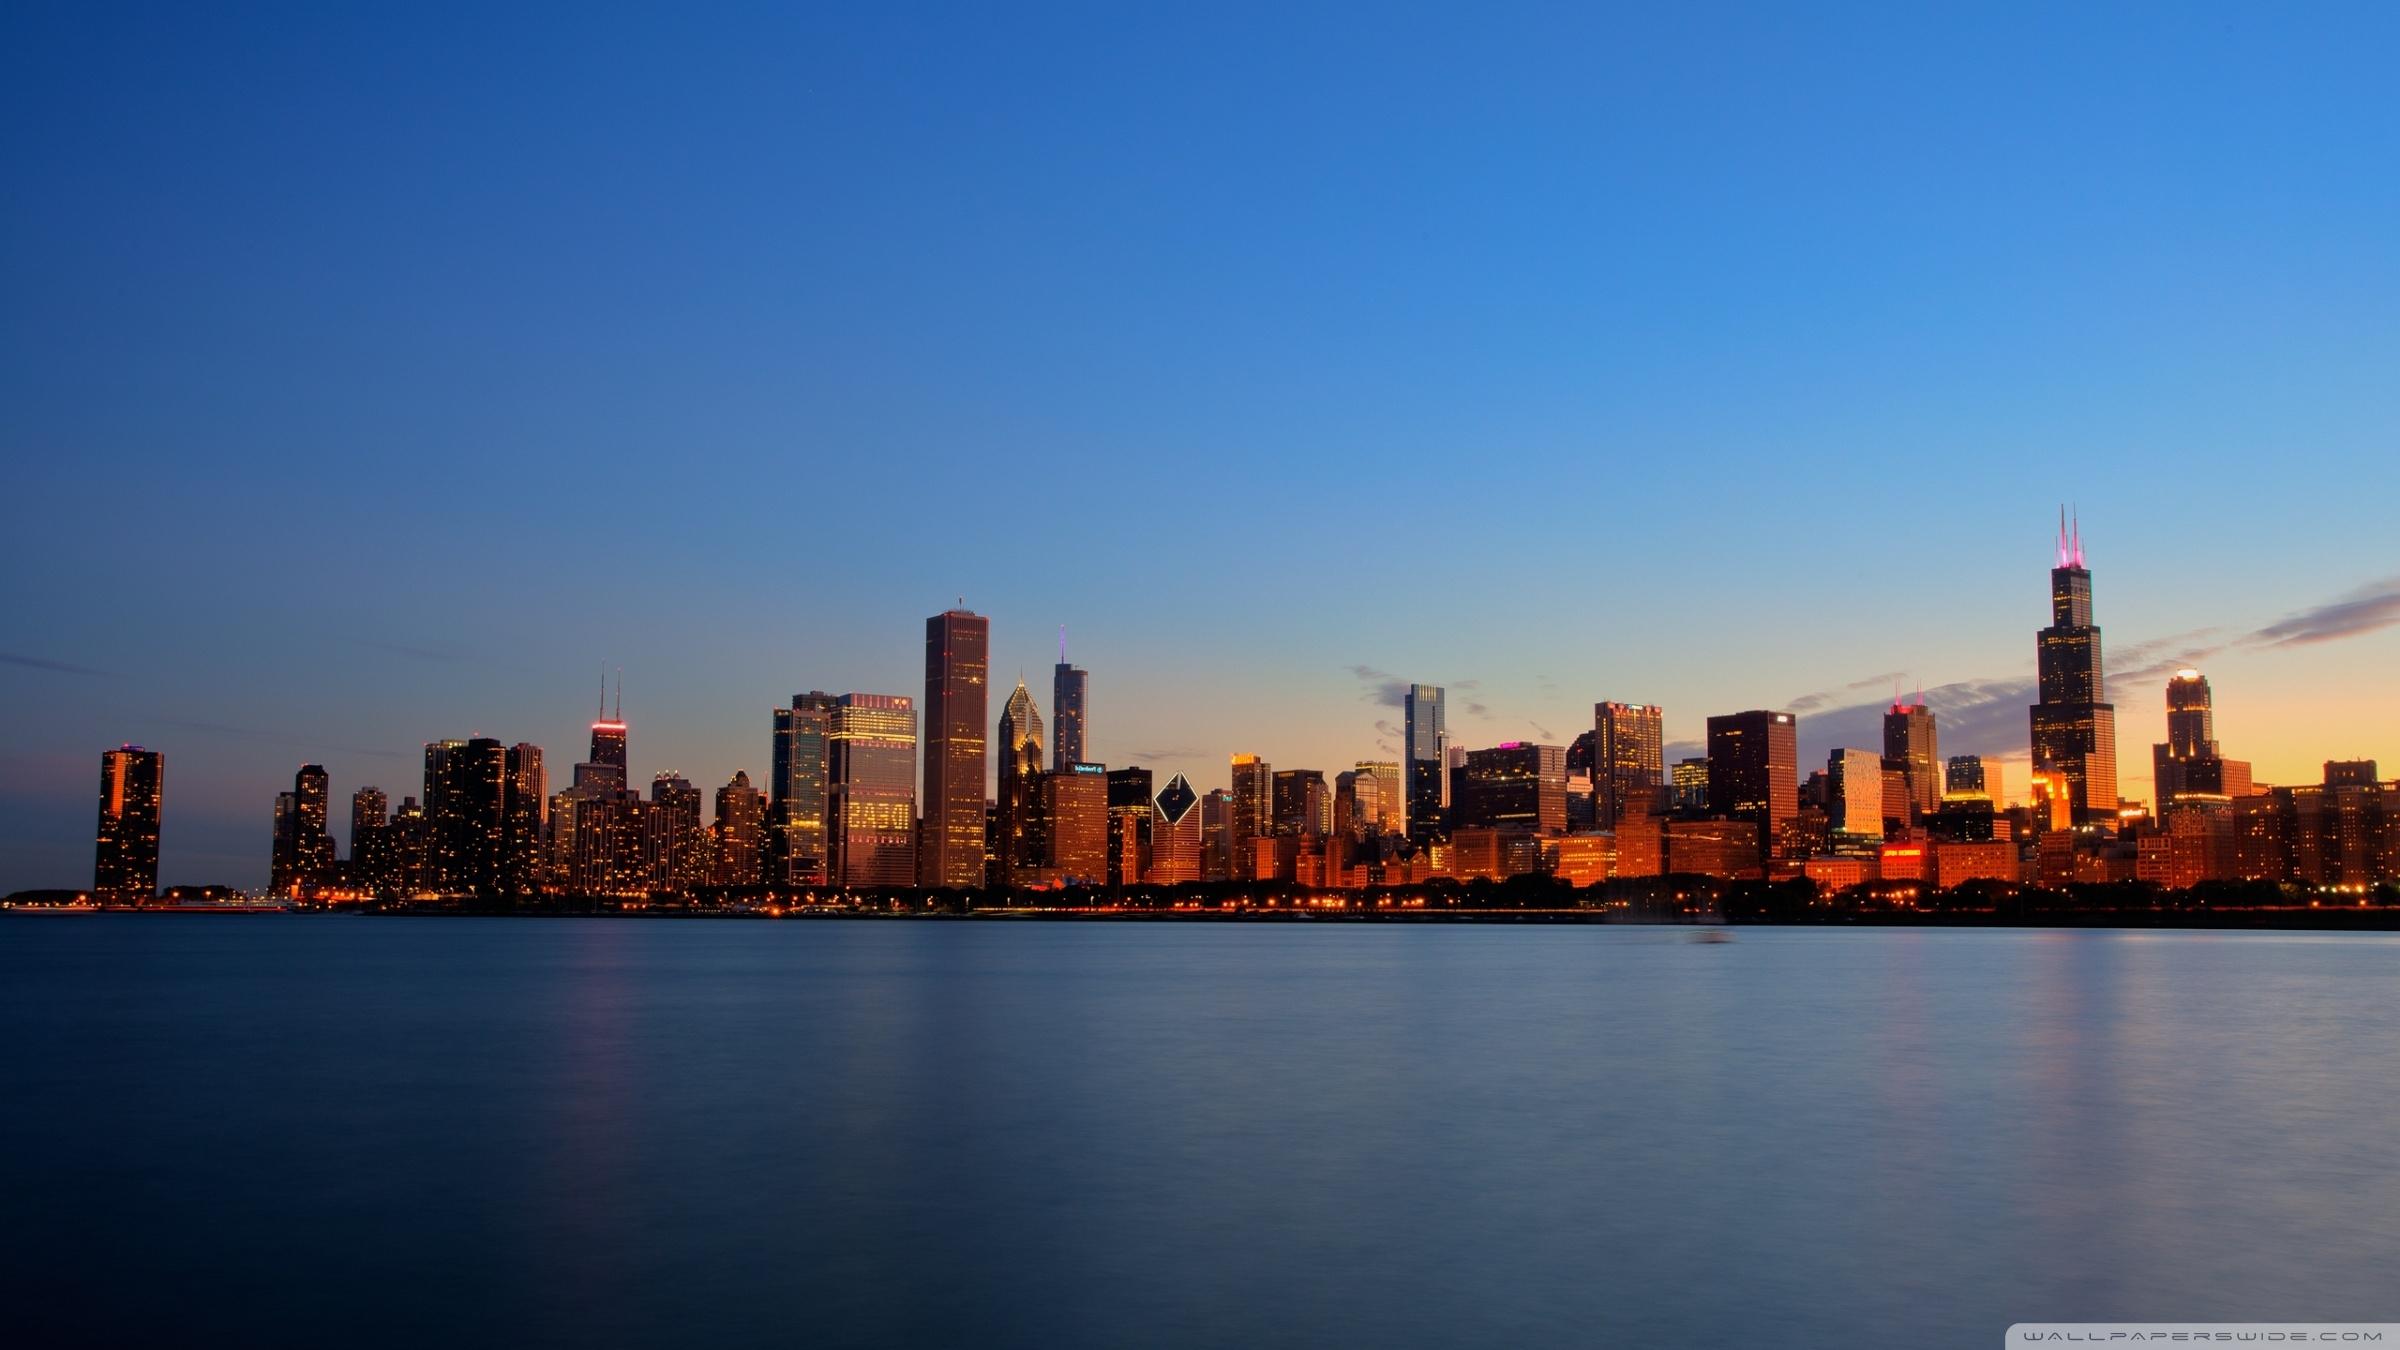 chicago skyline night ❤ 4k hd desktop wallpaper for 4k ultra hd tv